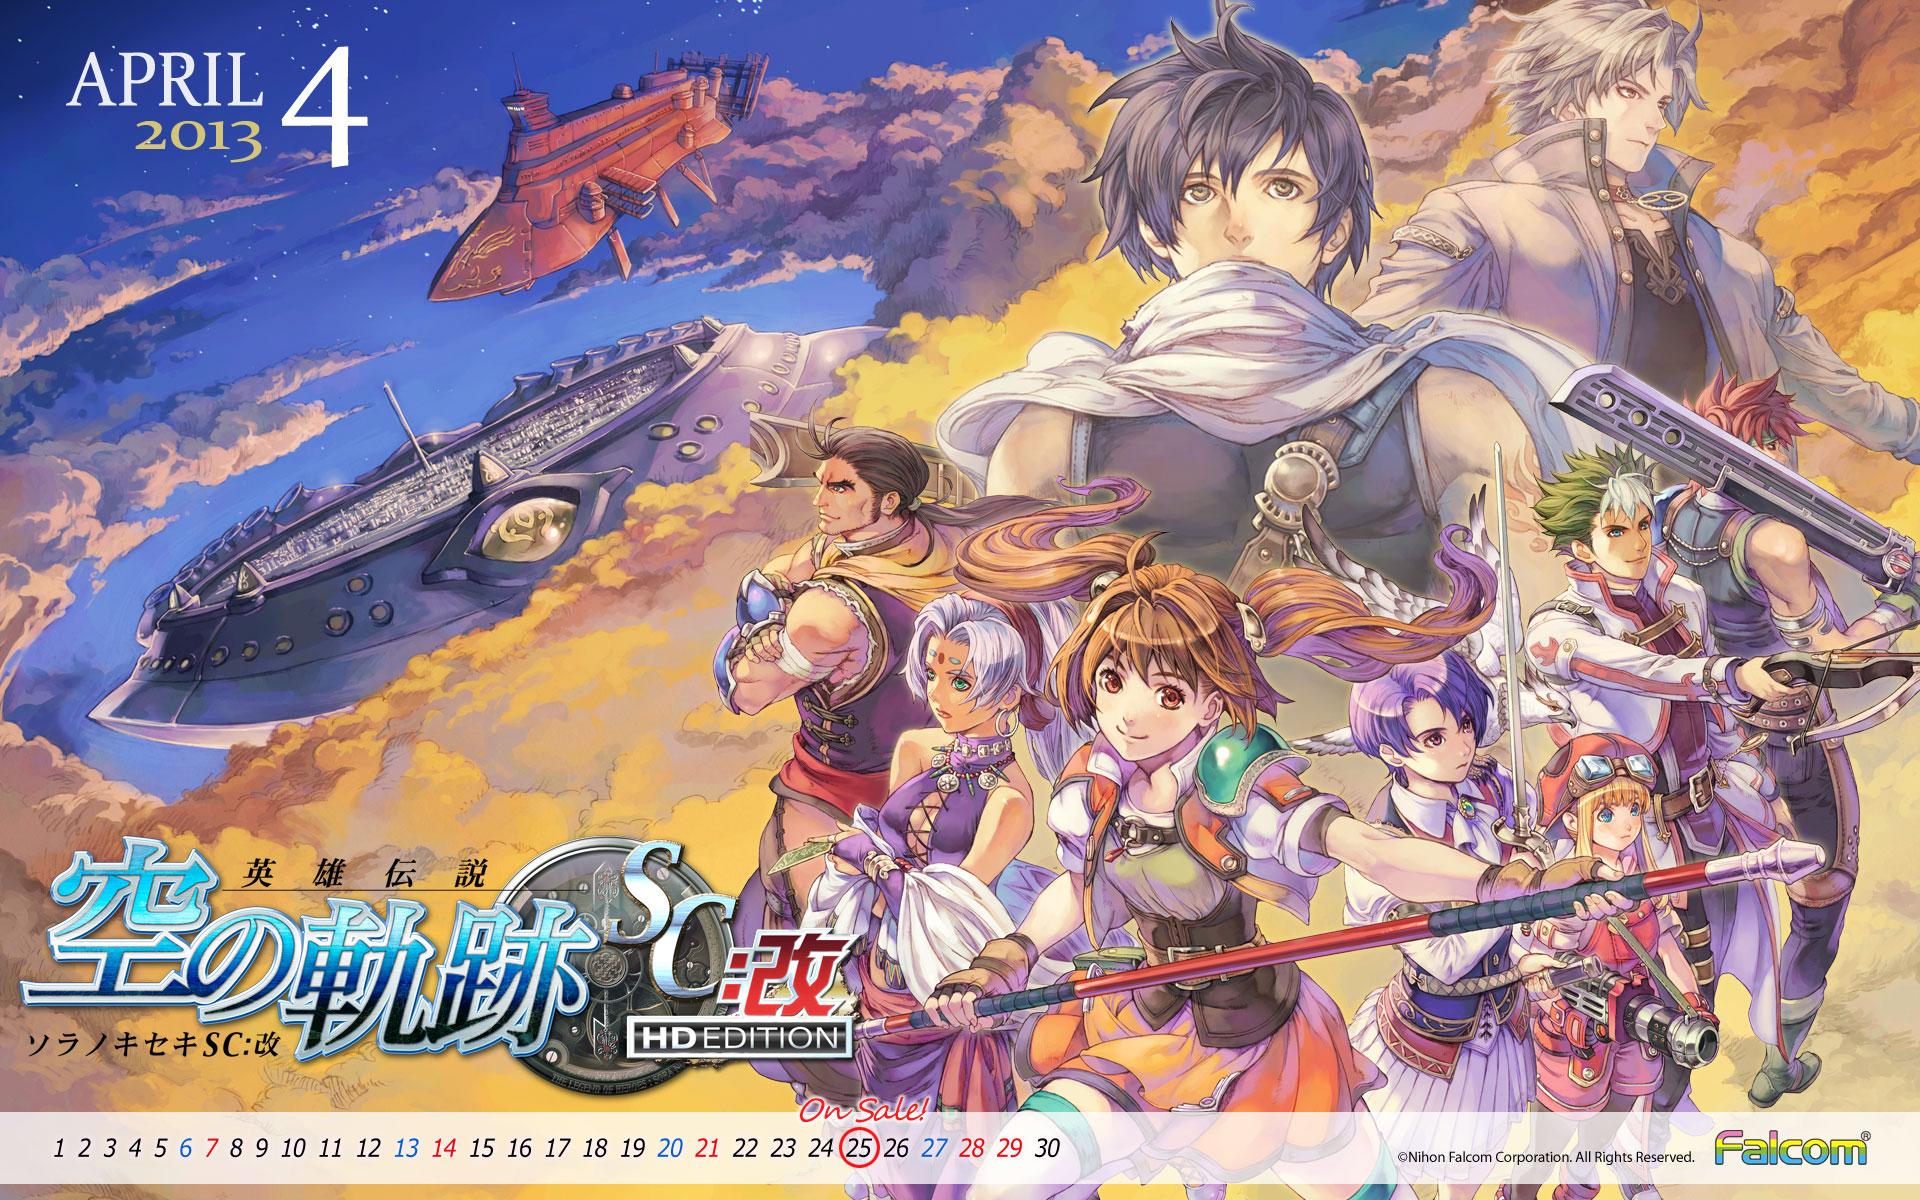 Games Movies Music Anime: Niho...